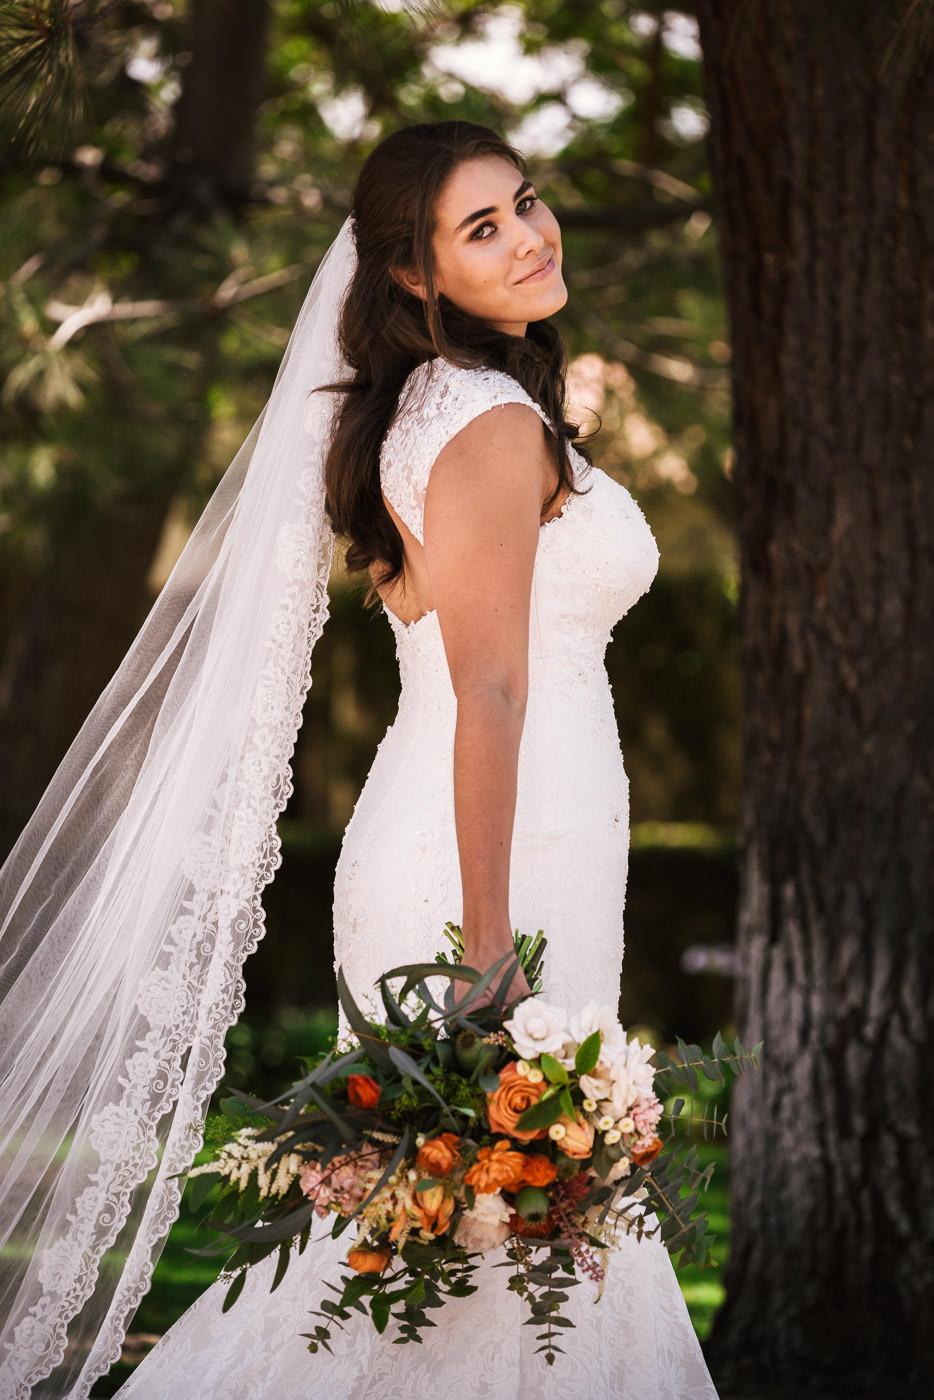 San Diego wedding photographer creates a stunning portrait of a bride.